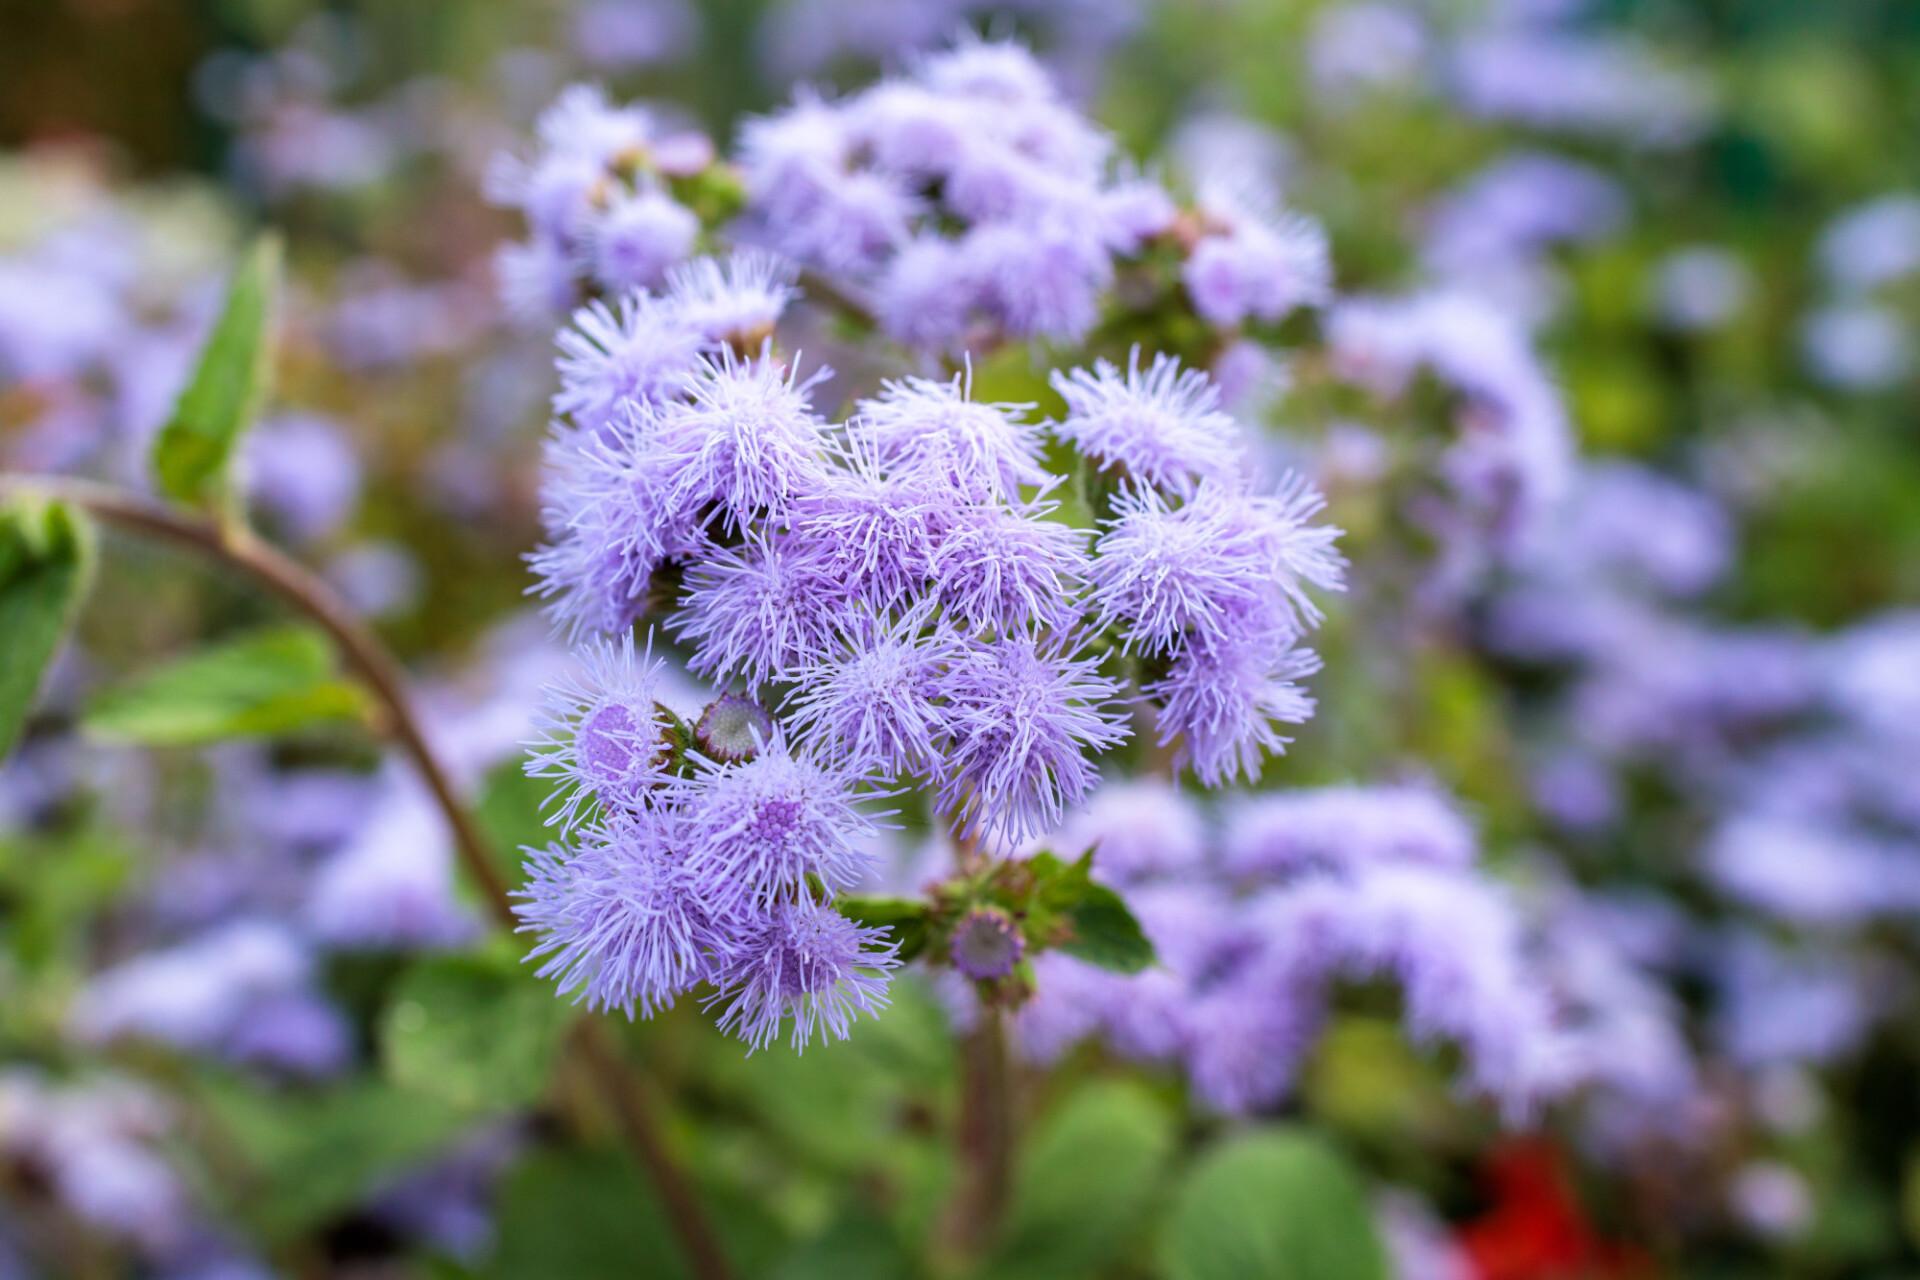 Interesting looking aster flower